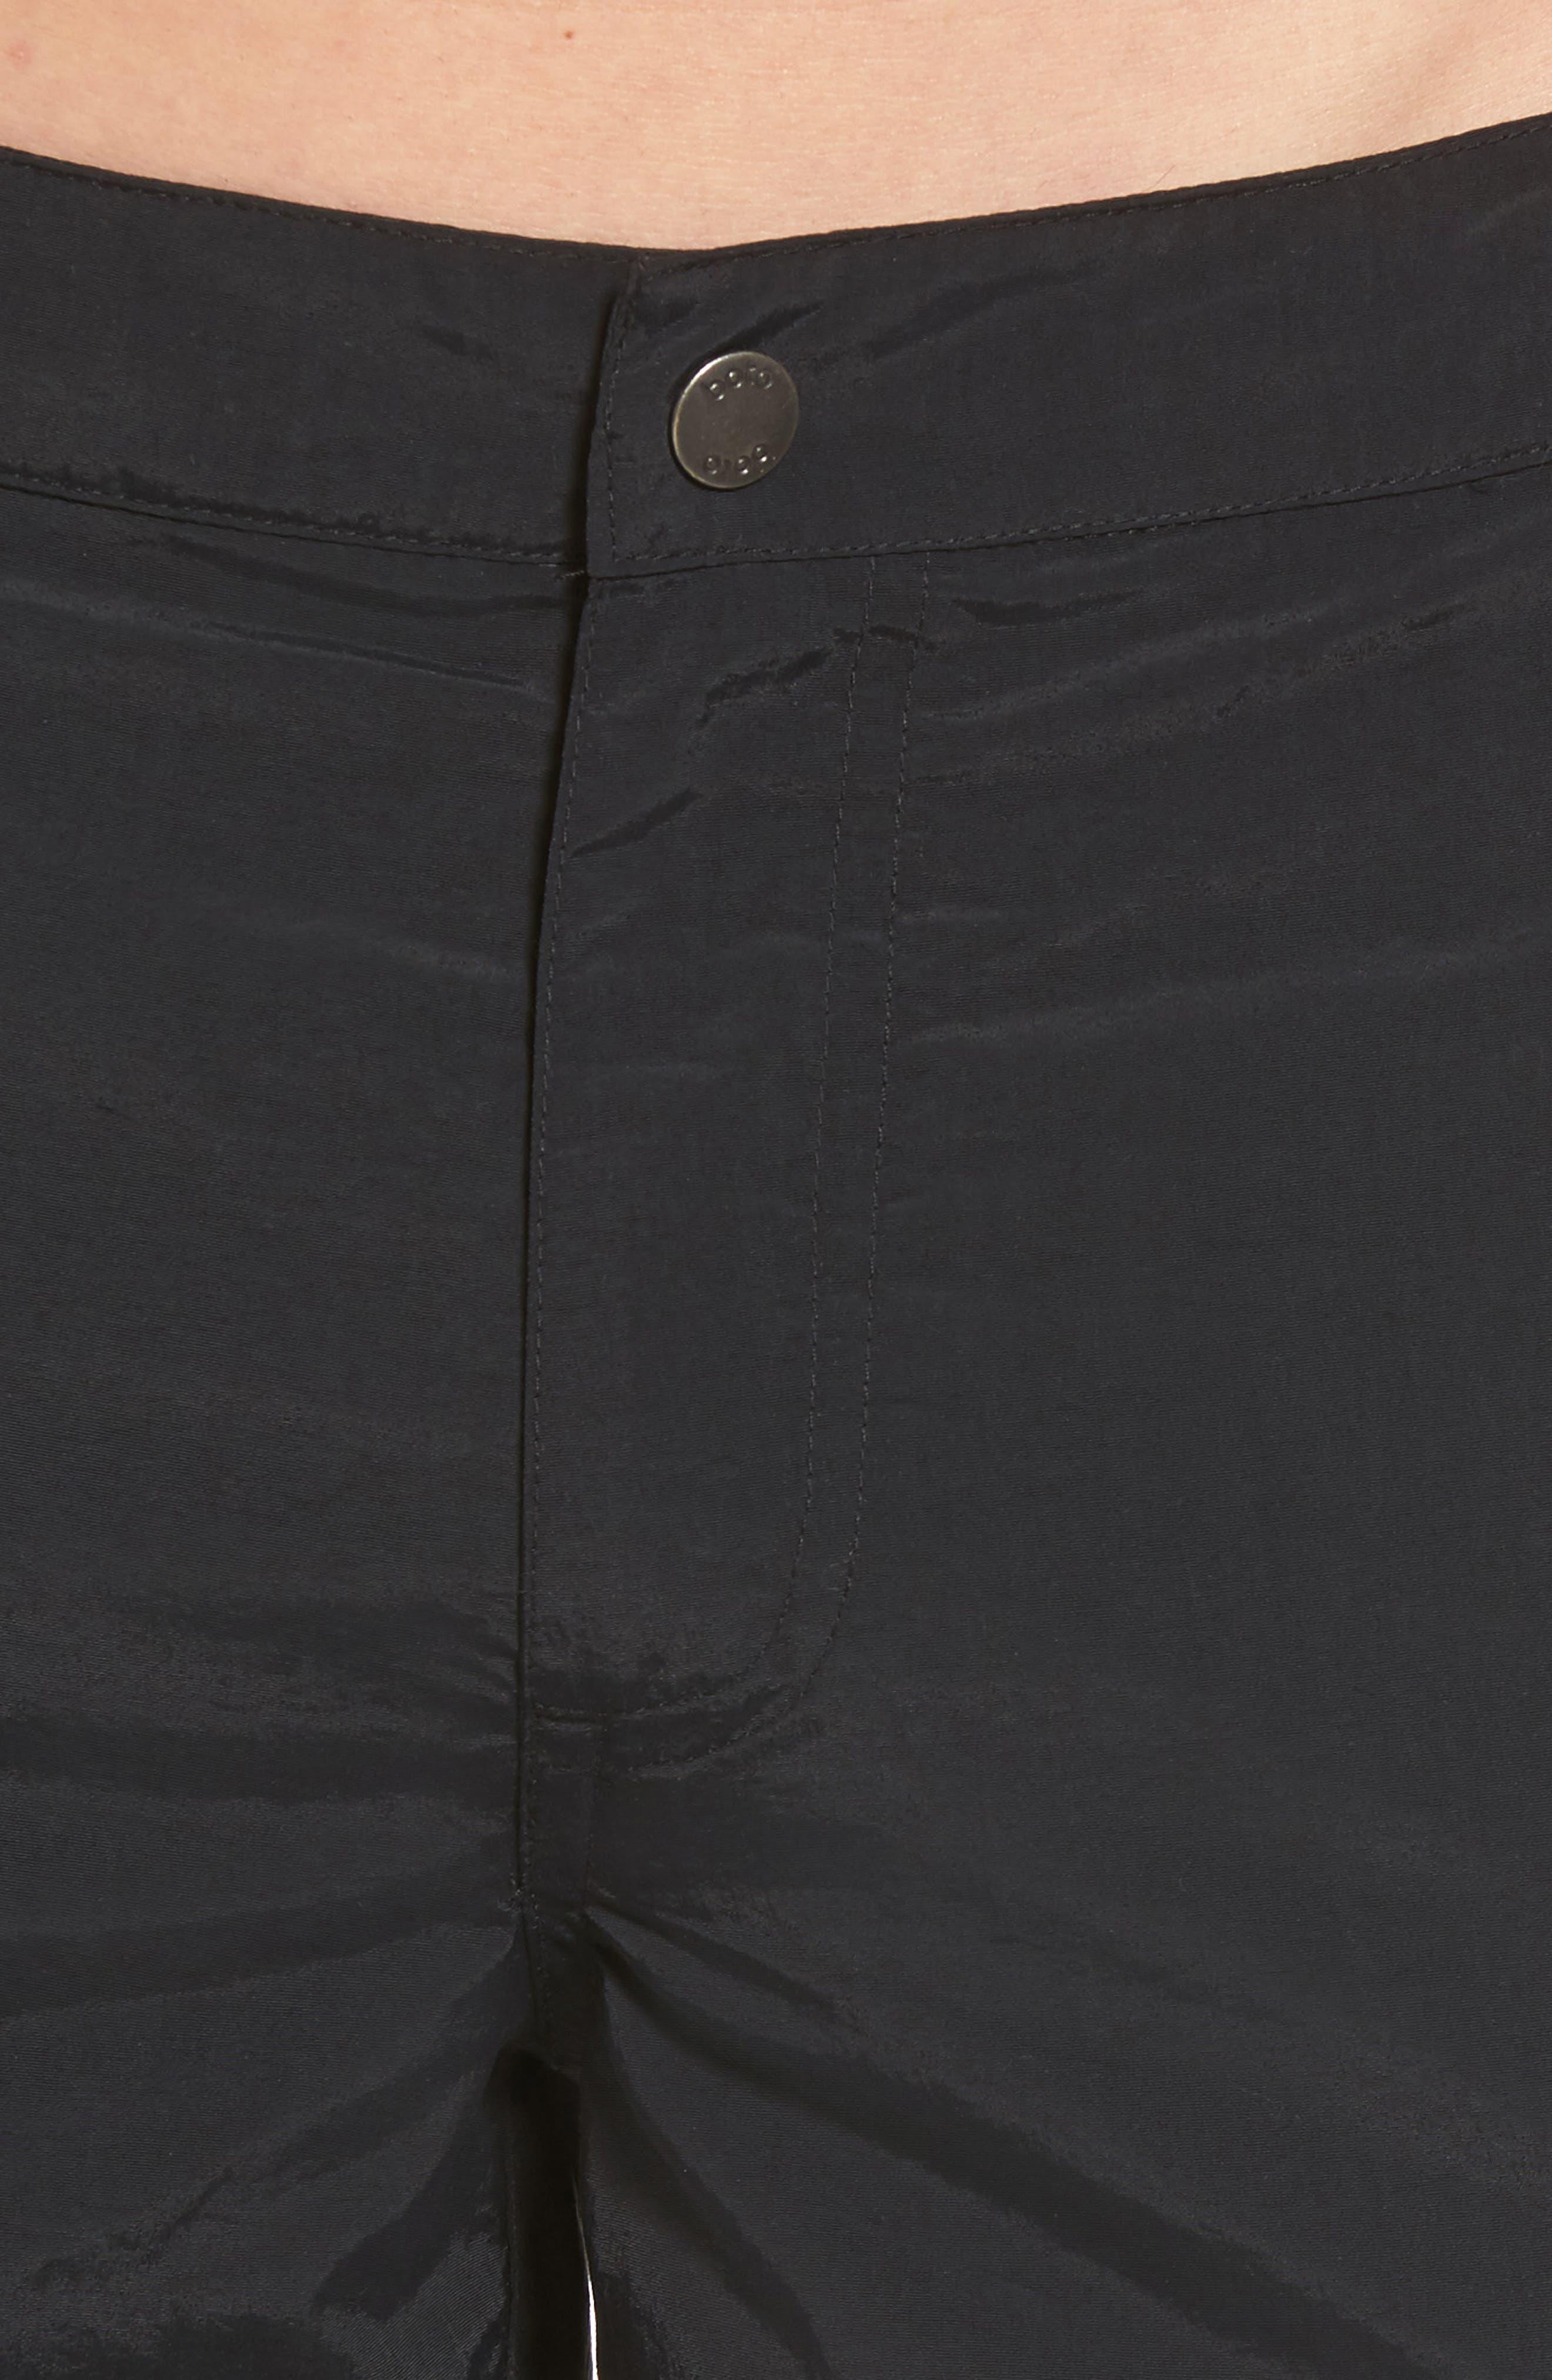 'Aruba - Island' Tailored Fit 8.5 Inch Board Shorts,                             Alternate thumbnail 16, color,